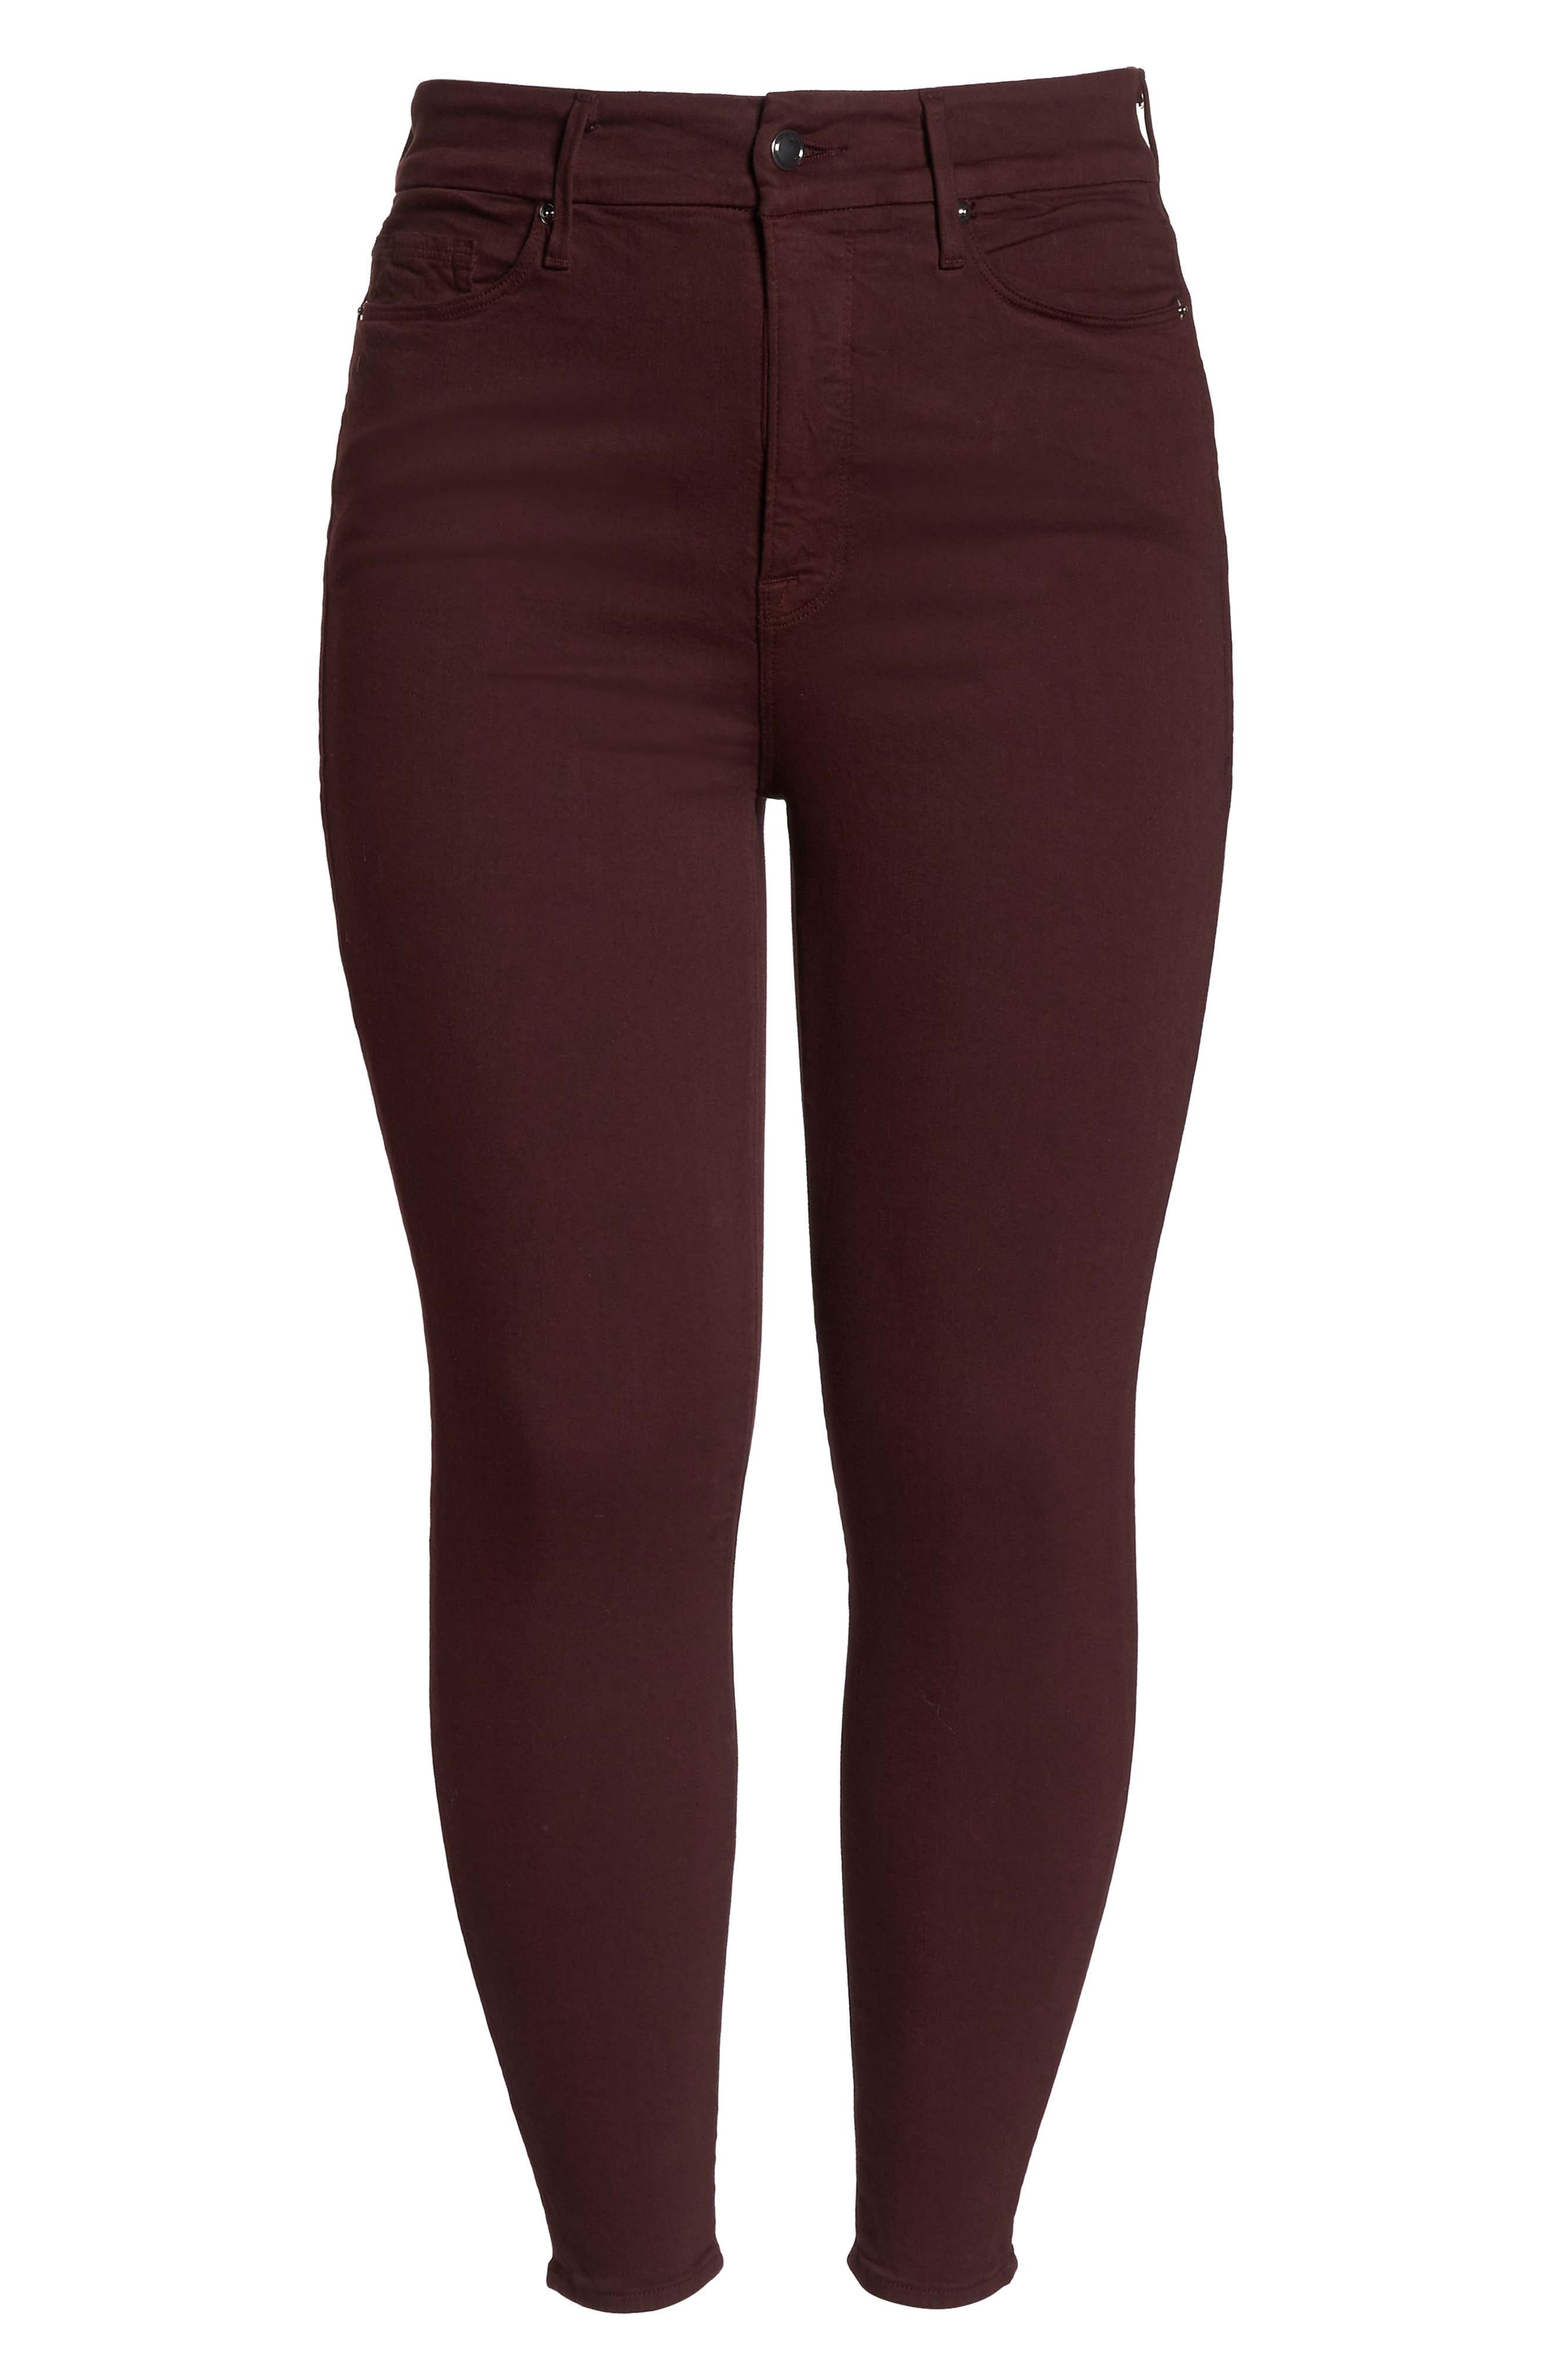 Good Legs High Waist Ankle Skinny Jeans,                             Alternate thumbnail 13, color,                             BURGUNDY 001